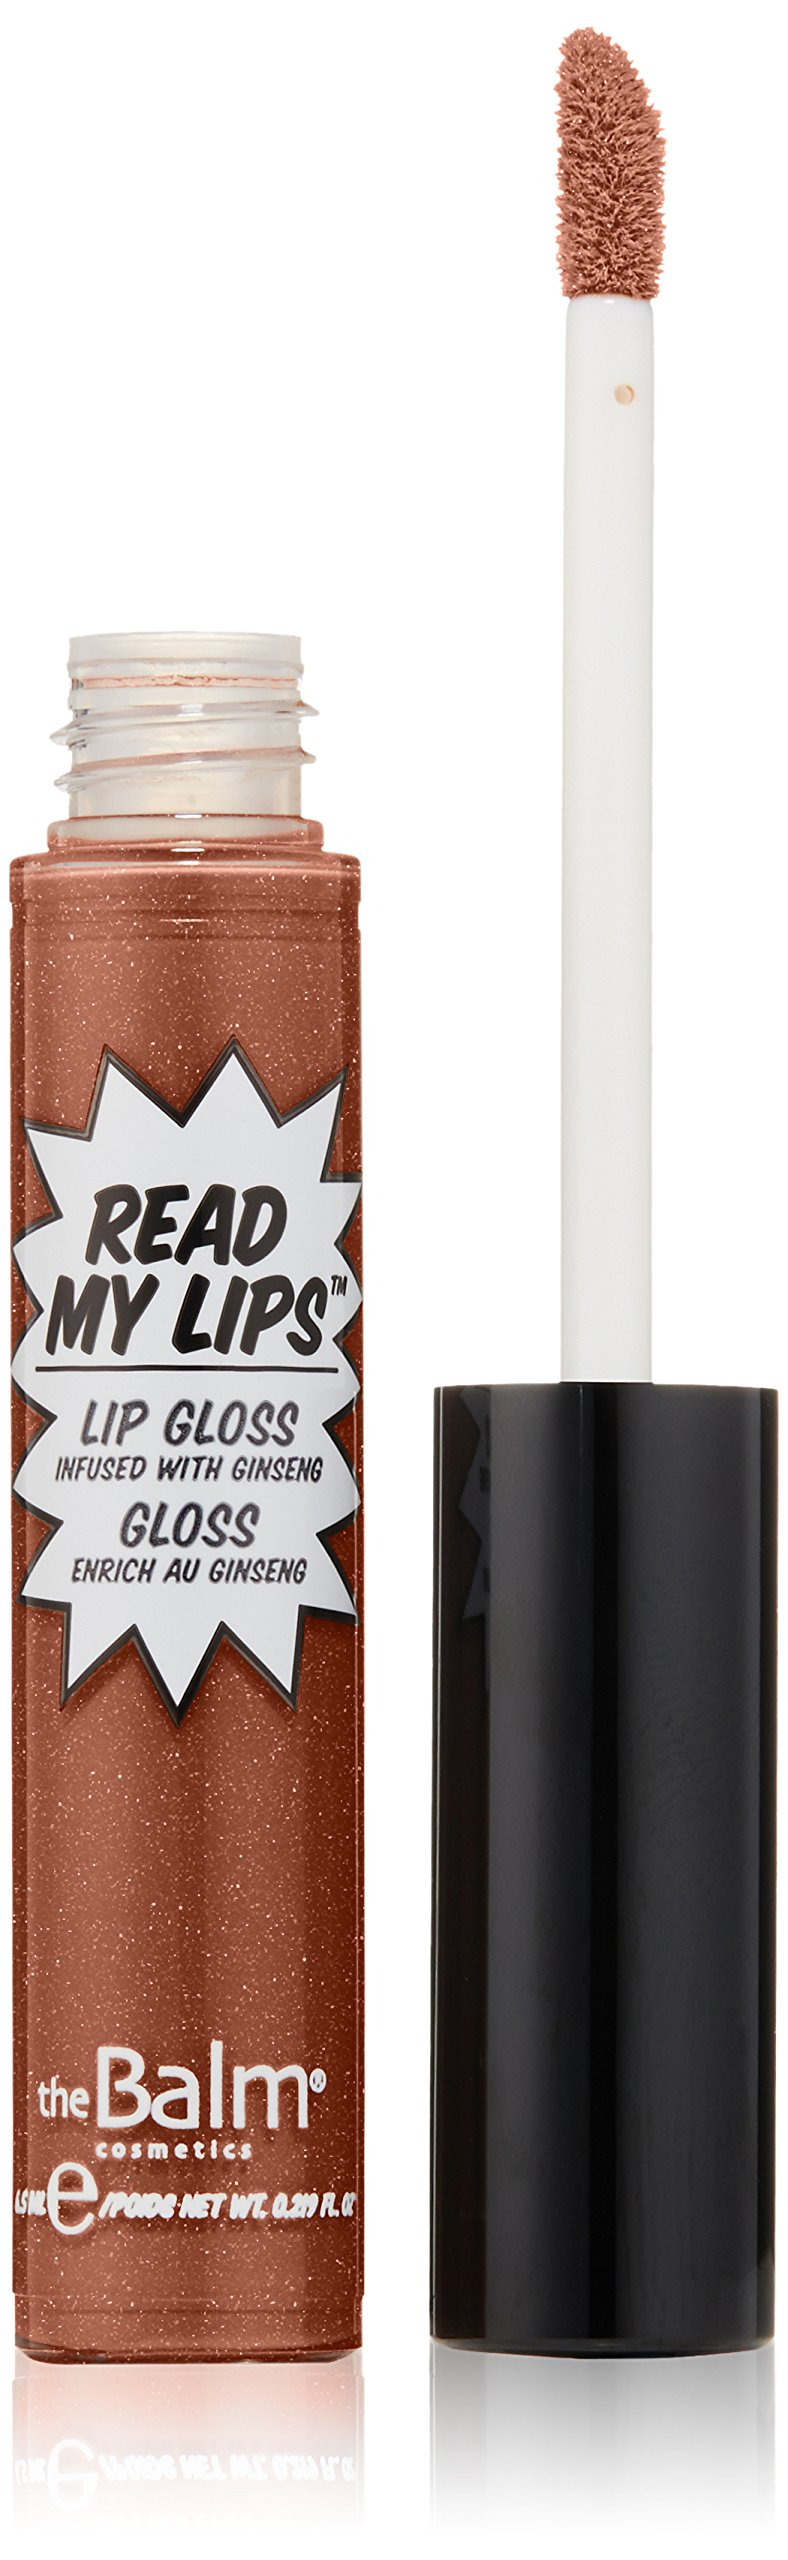 theBalm Cosmetics Read My Lips Lip Gloss